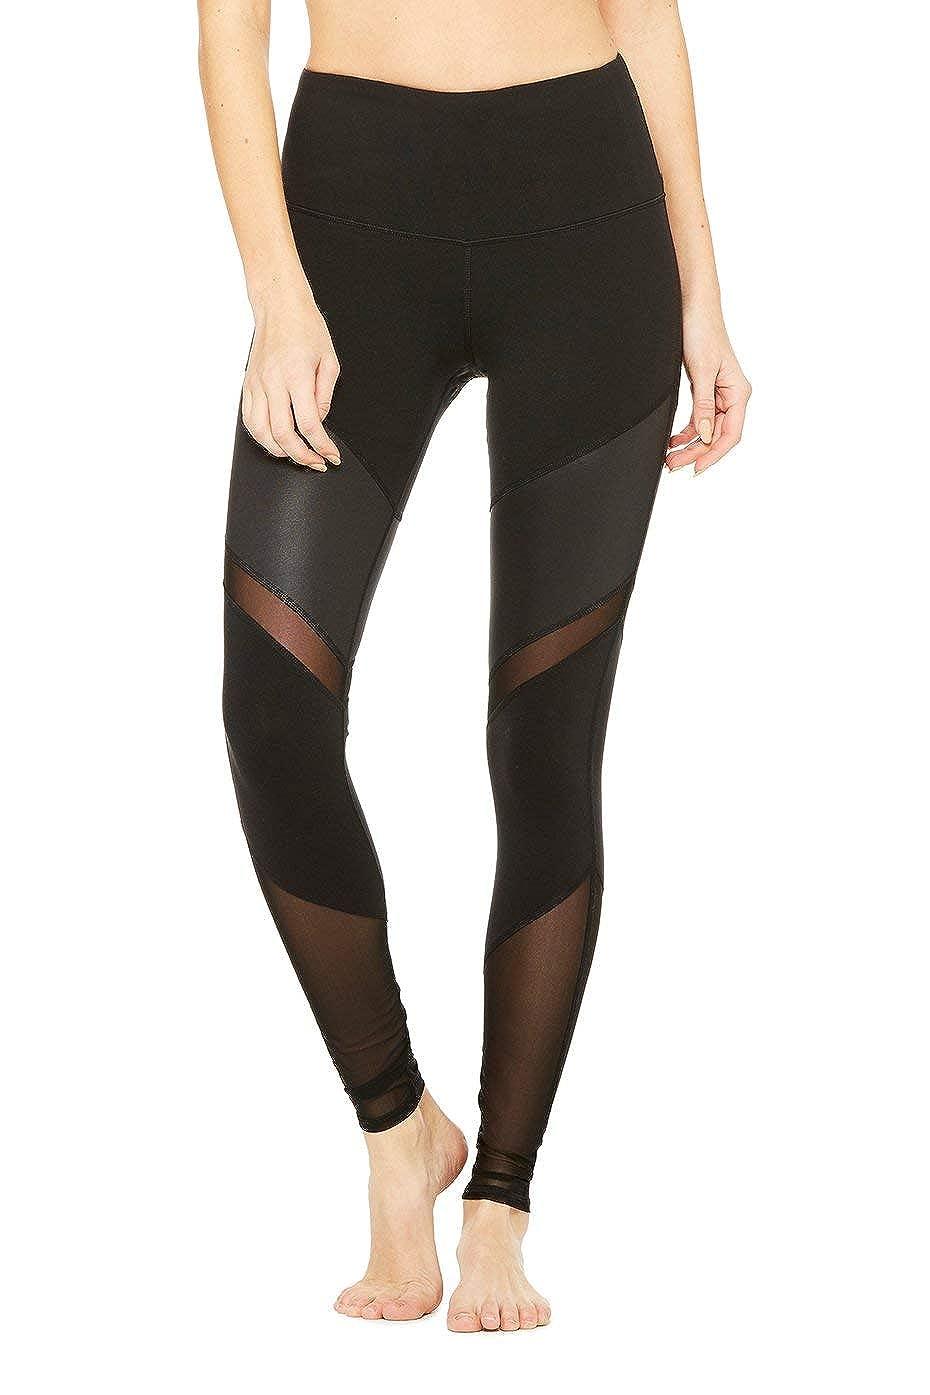 Amazon.com: Alo Womens High-Waist Sheila Legging, Black ...